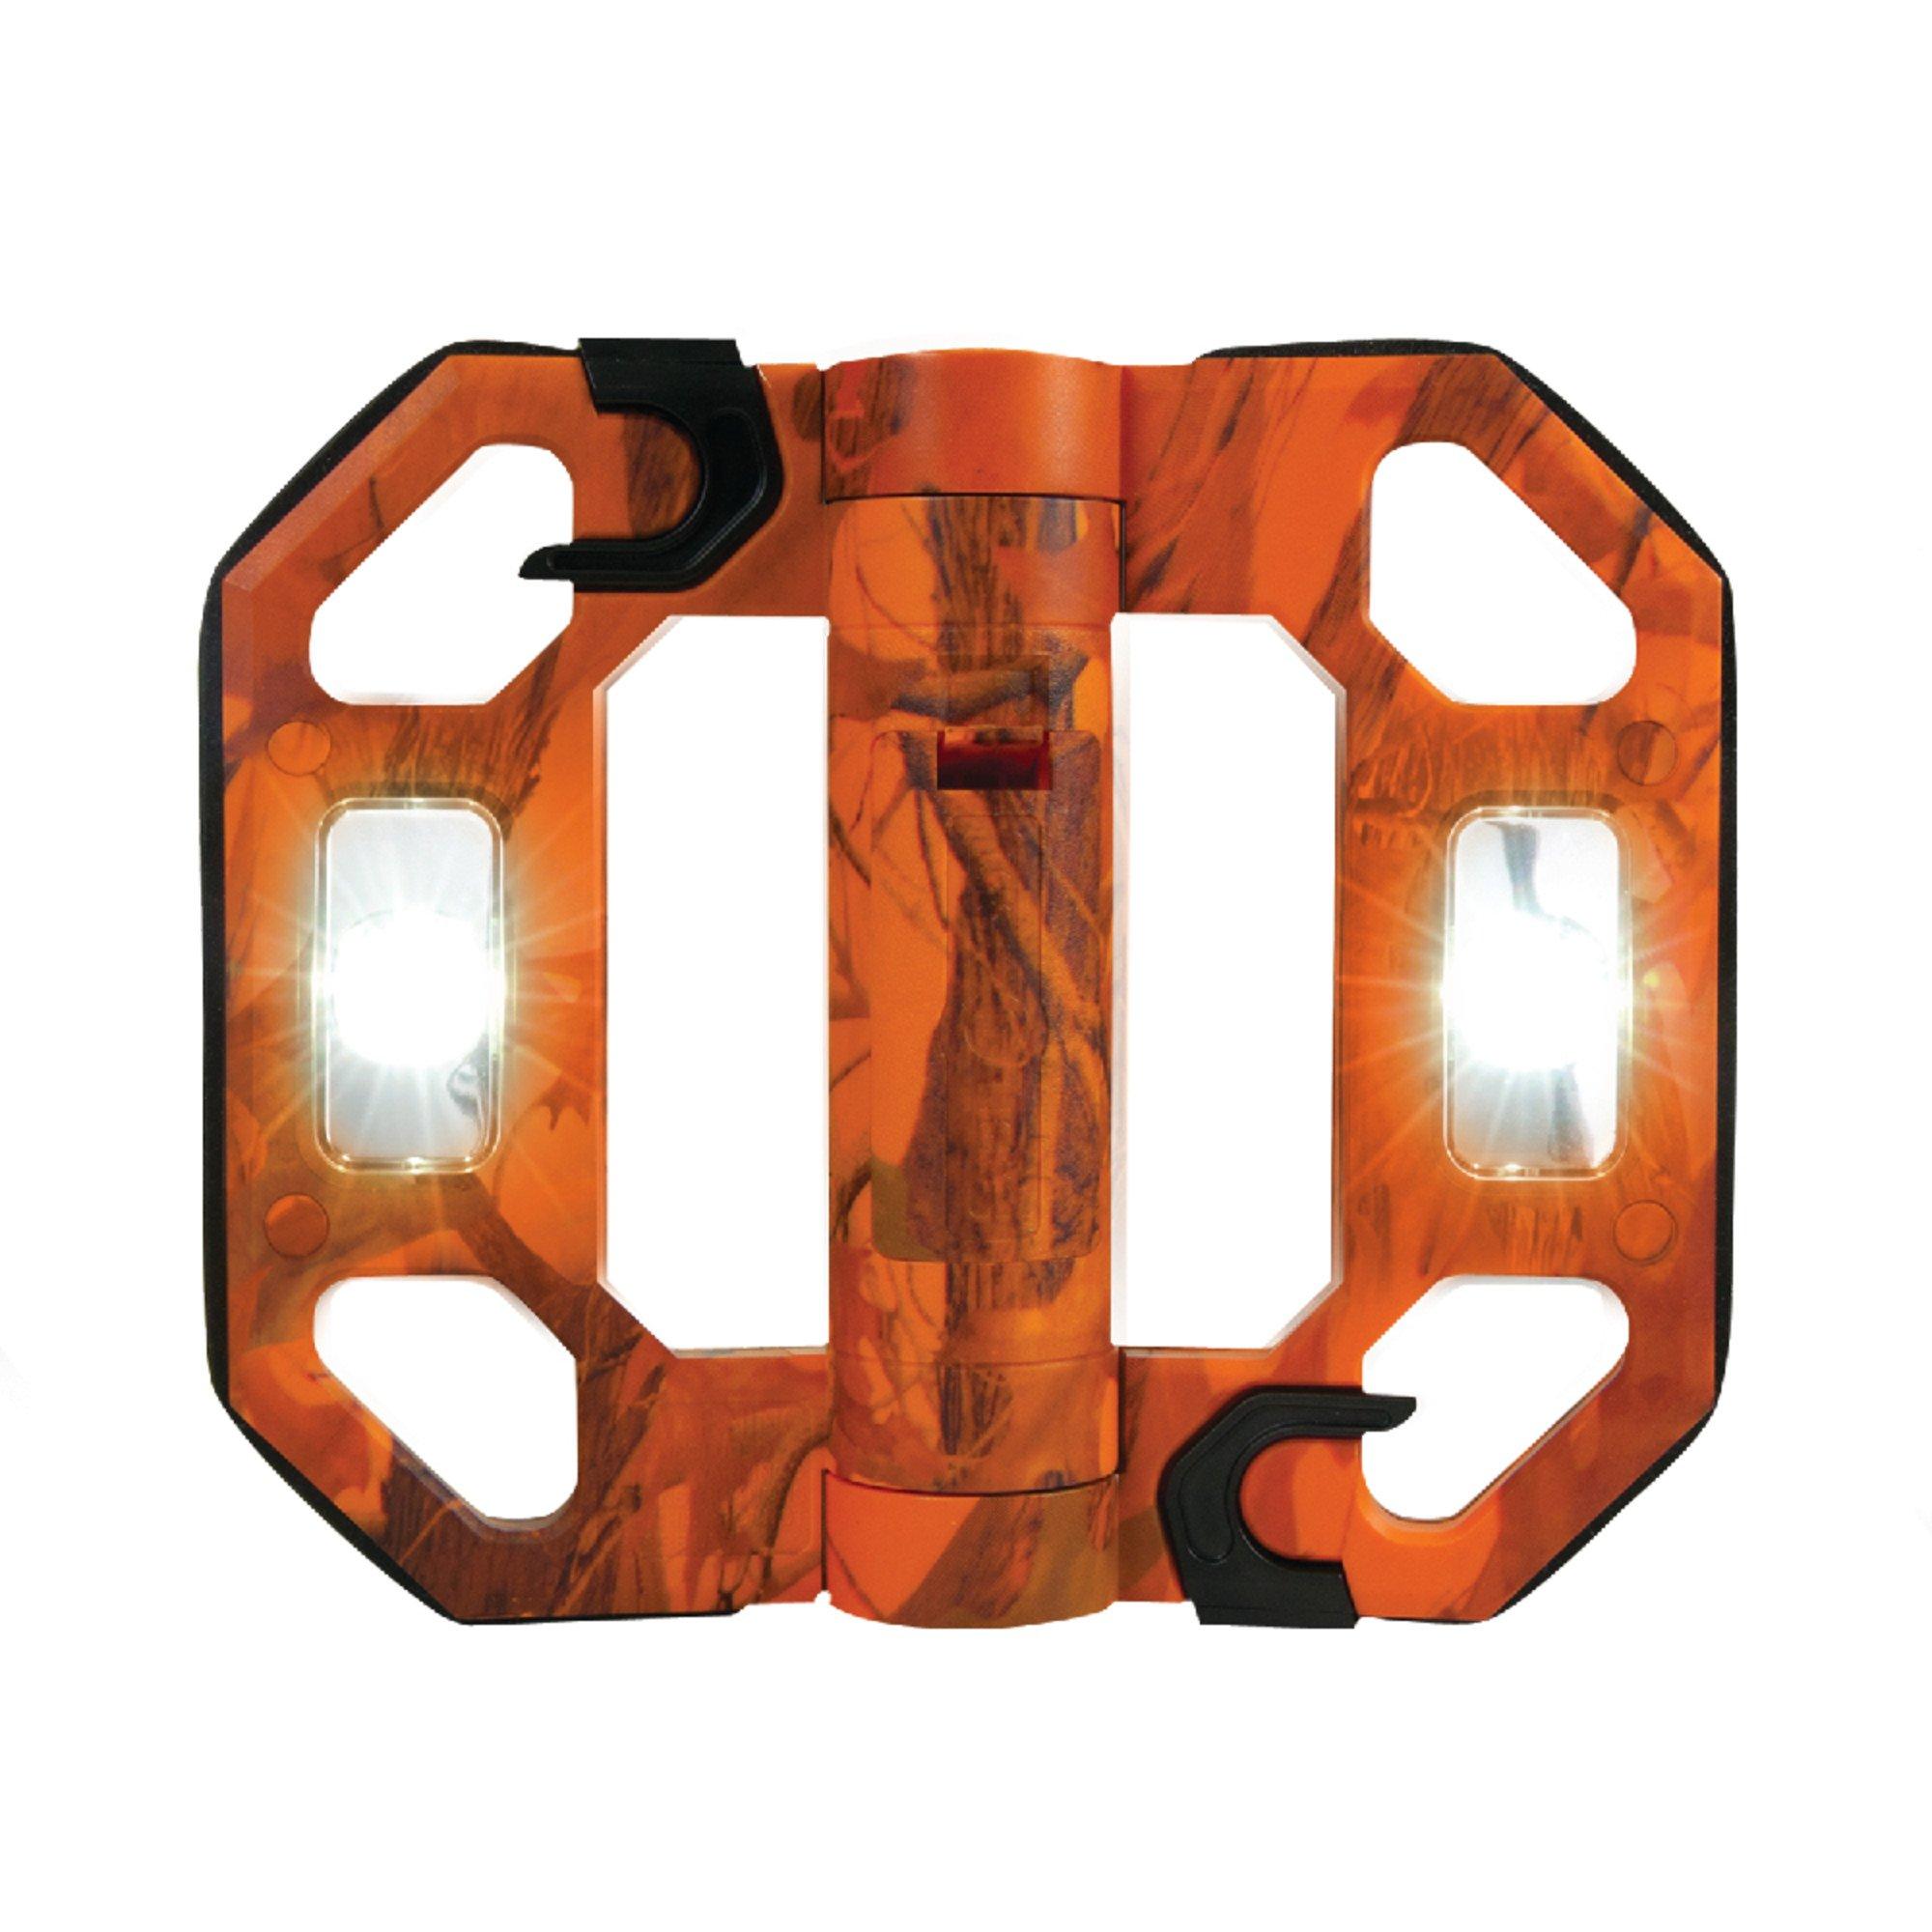 All-Pro LED125O 200-Lumen Mini Compact Folding LED Work Light, Orange